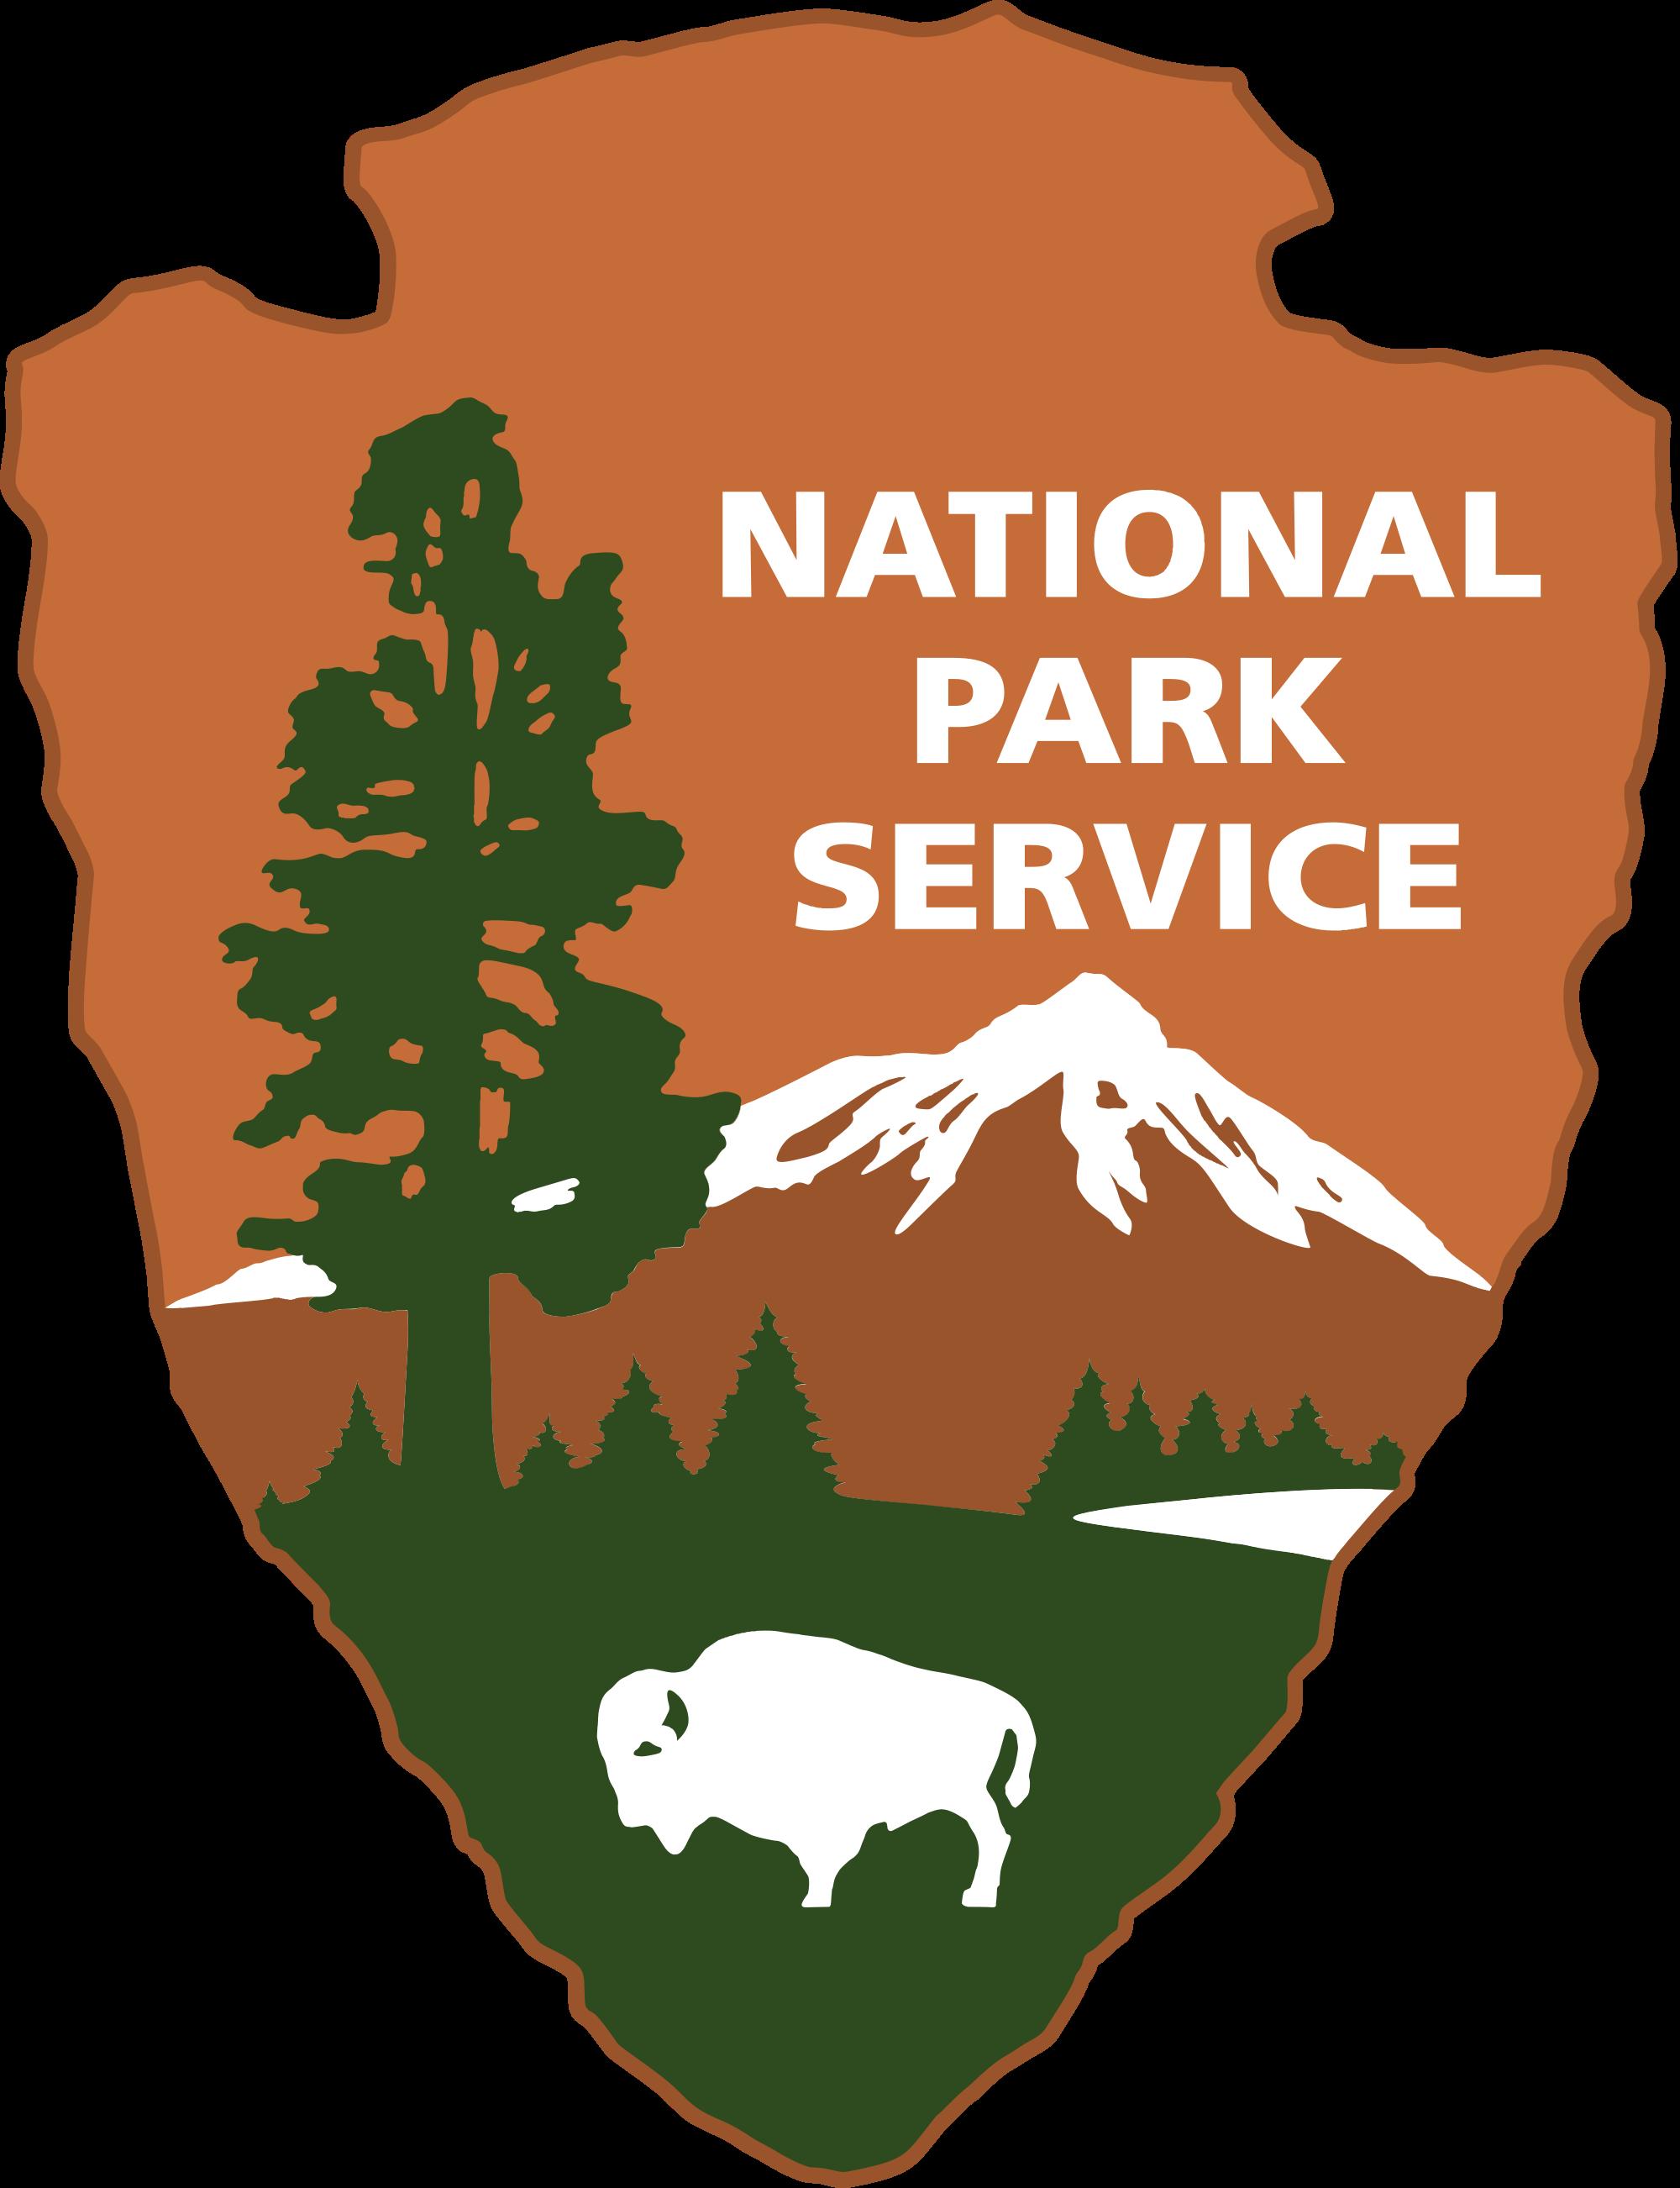 National Park Services